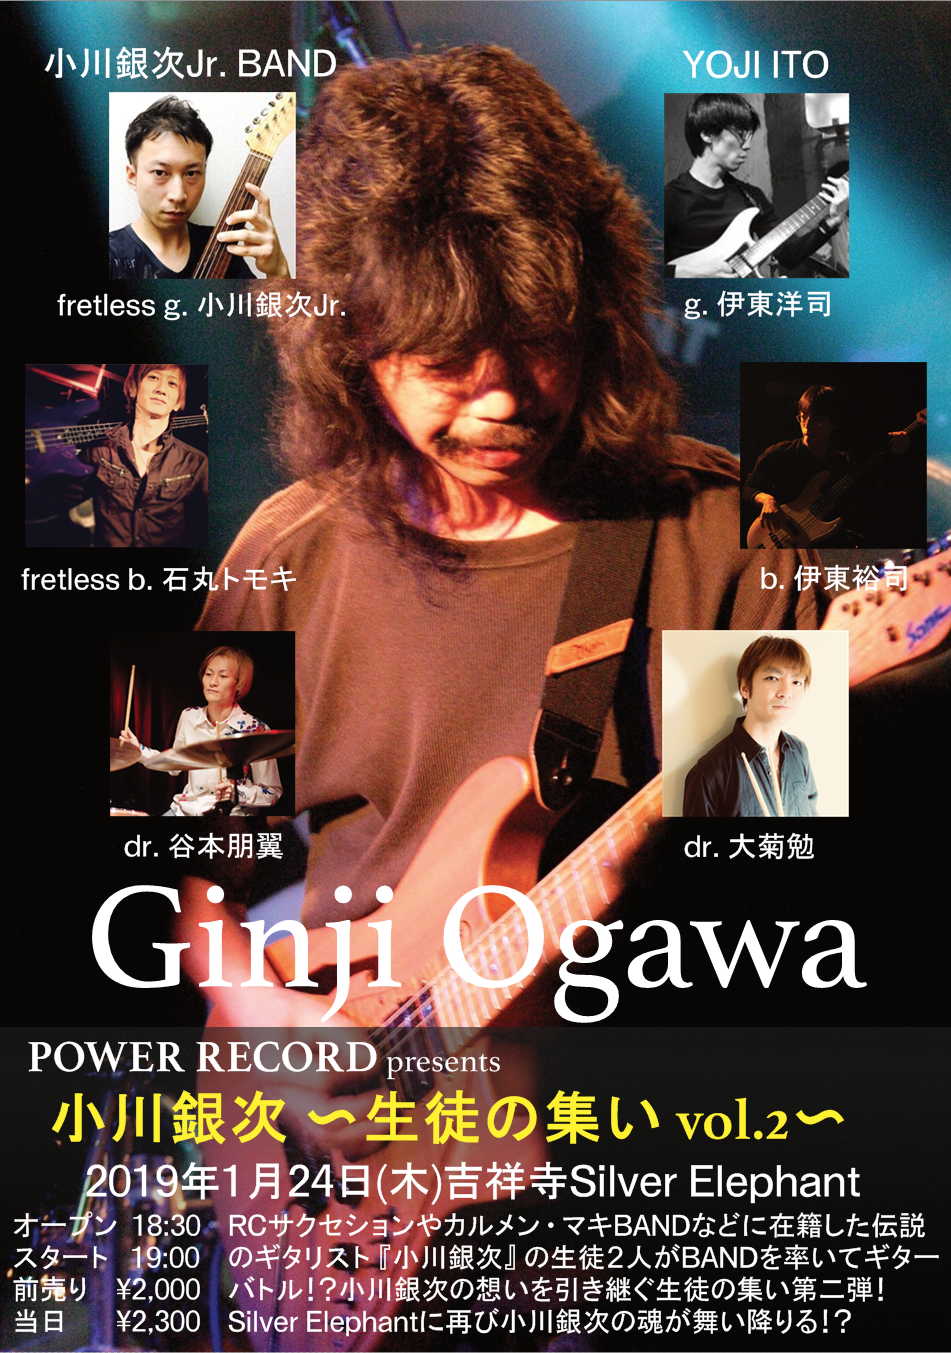 http://ginjiogawa.co.uk/blog/2019_12_24_01.png